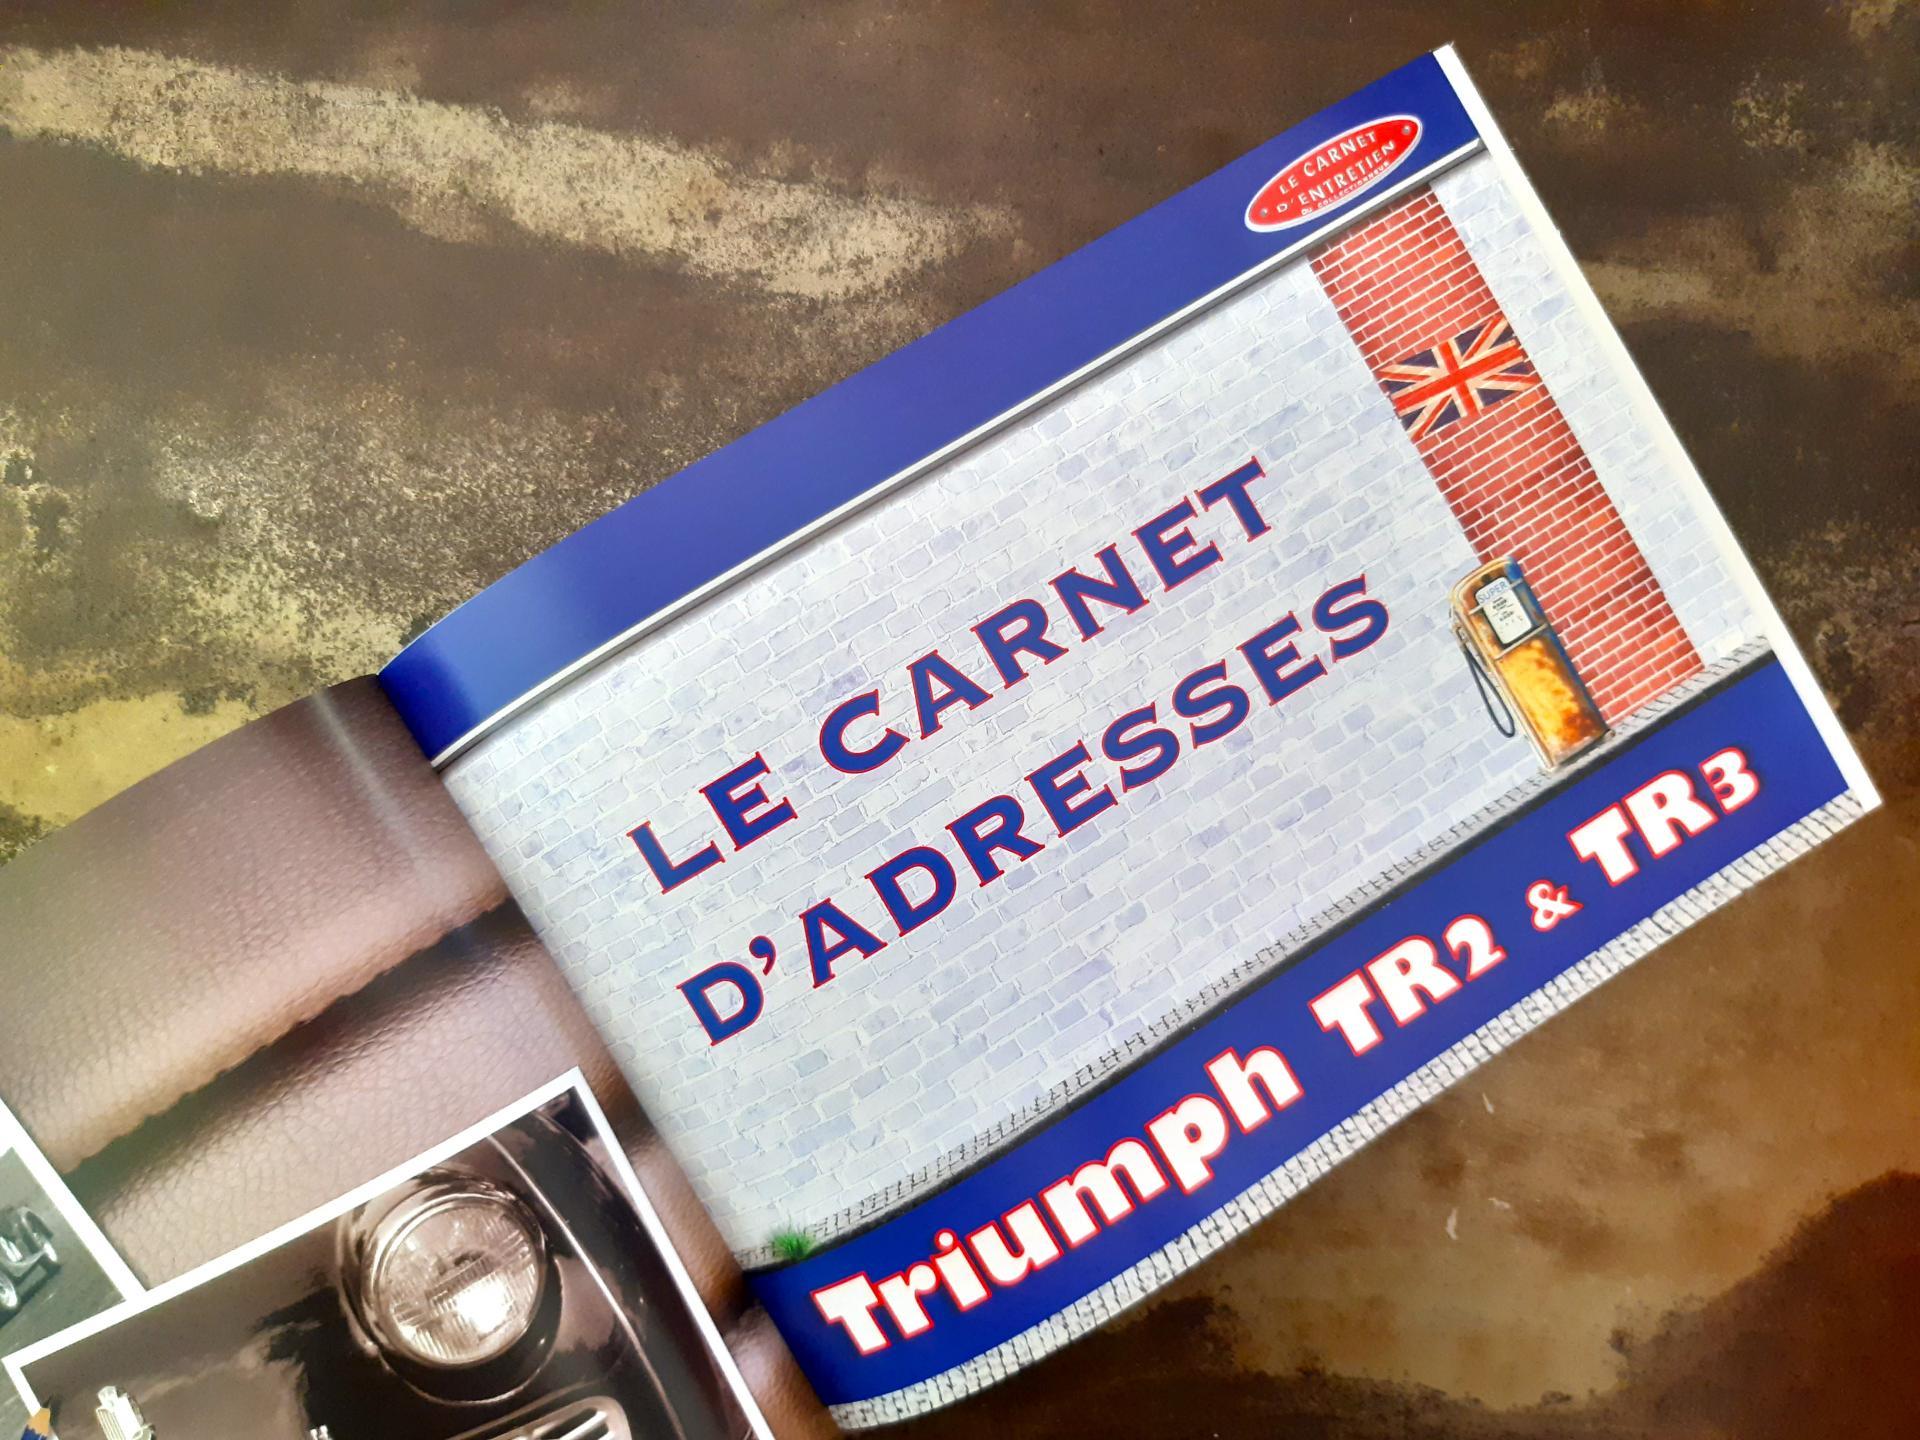 Carnet triumph